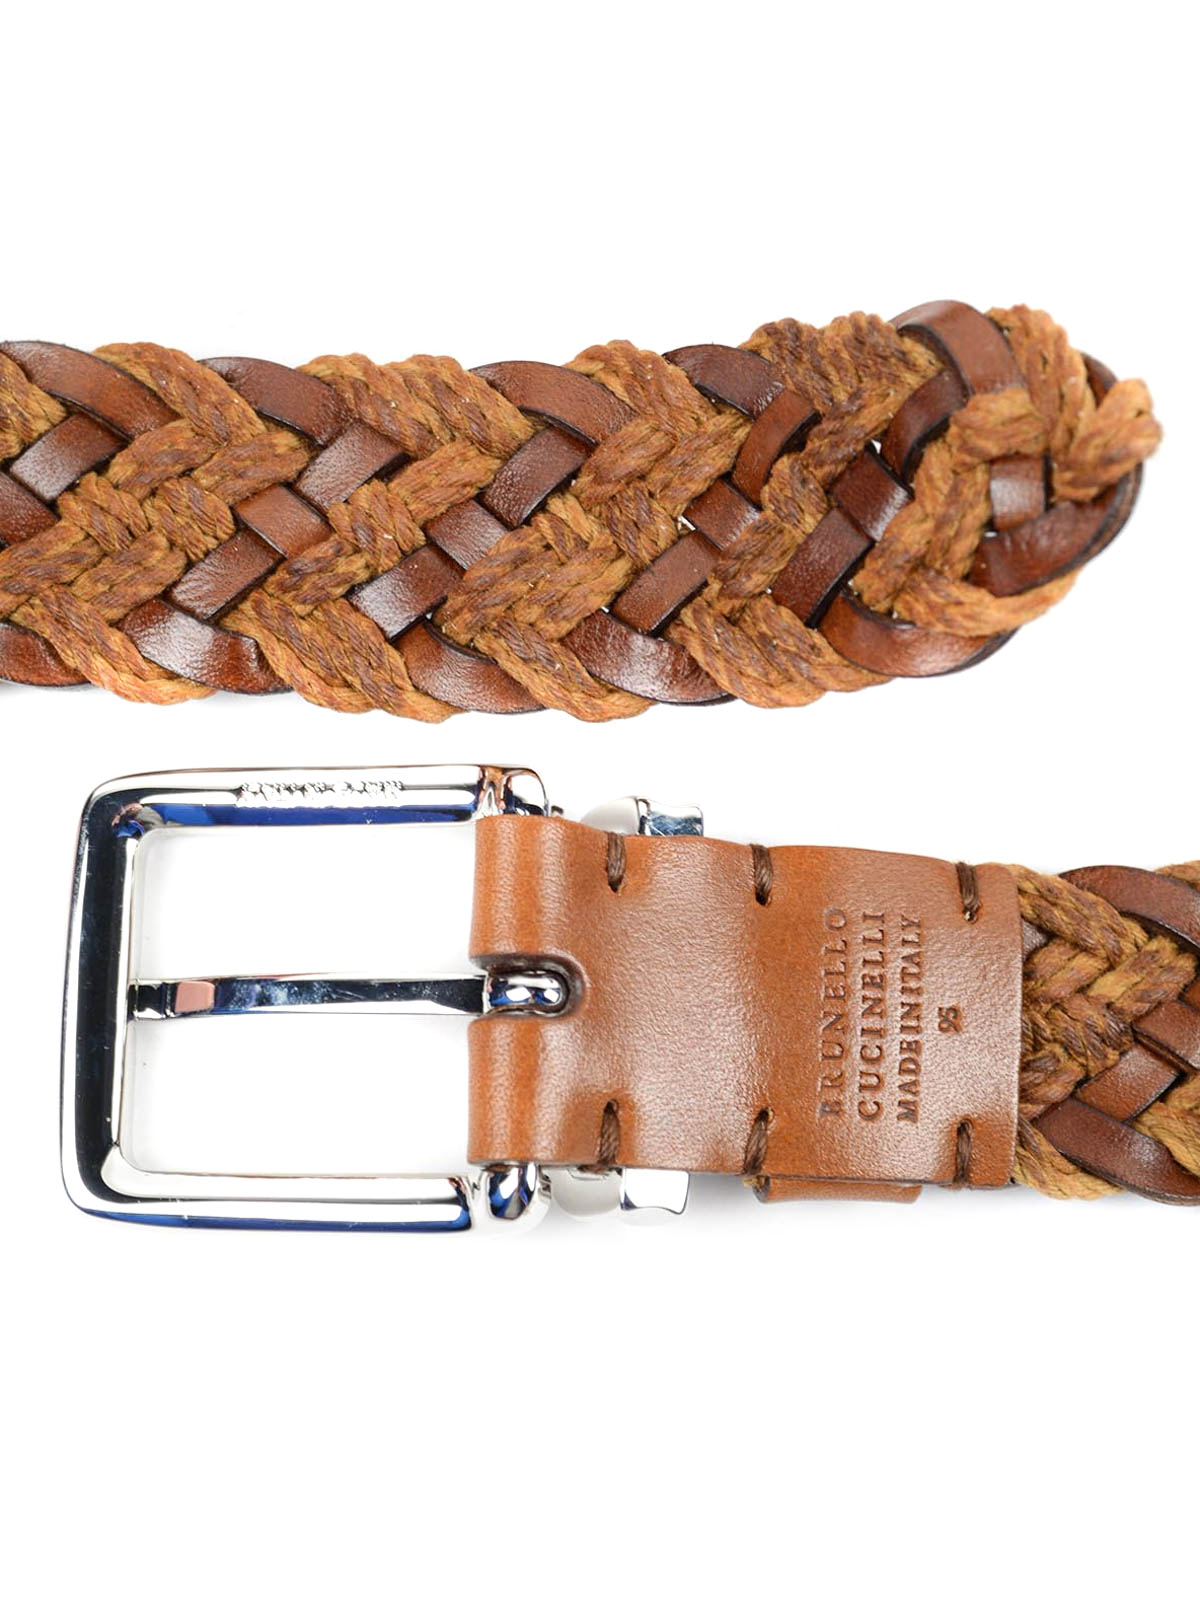 Shop Belts. Design Your Own Buckle Canvas Web Belt Supplies Pre-Cut Canvas Web Belts Interchangeable Web Belts Interchangeable Web Belts Canvas Web Belt Rolls Belt Buckles